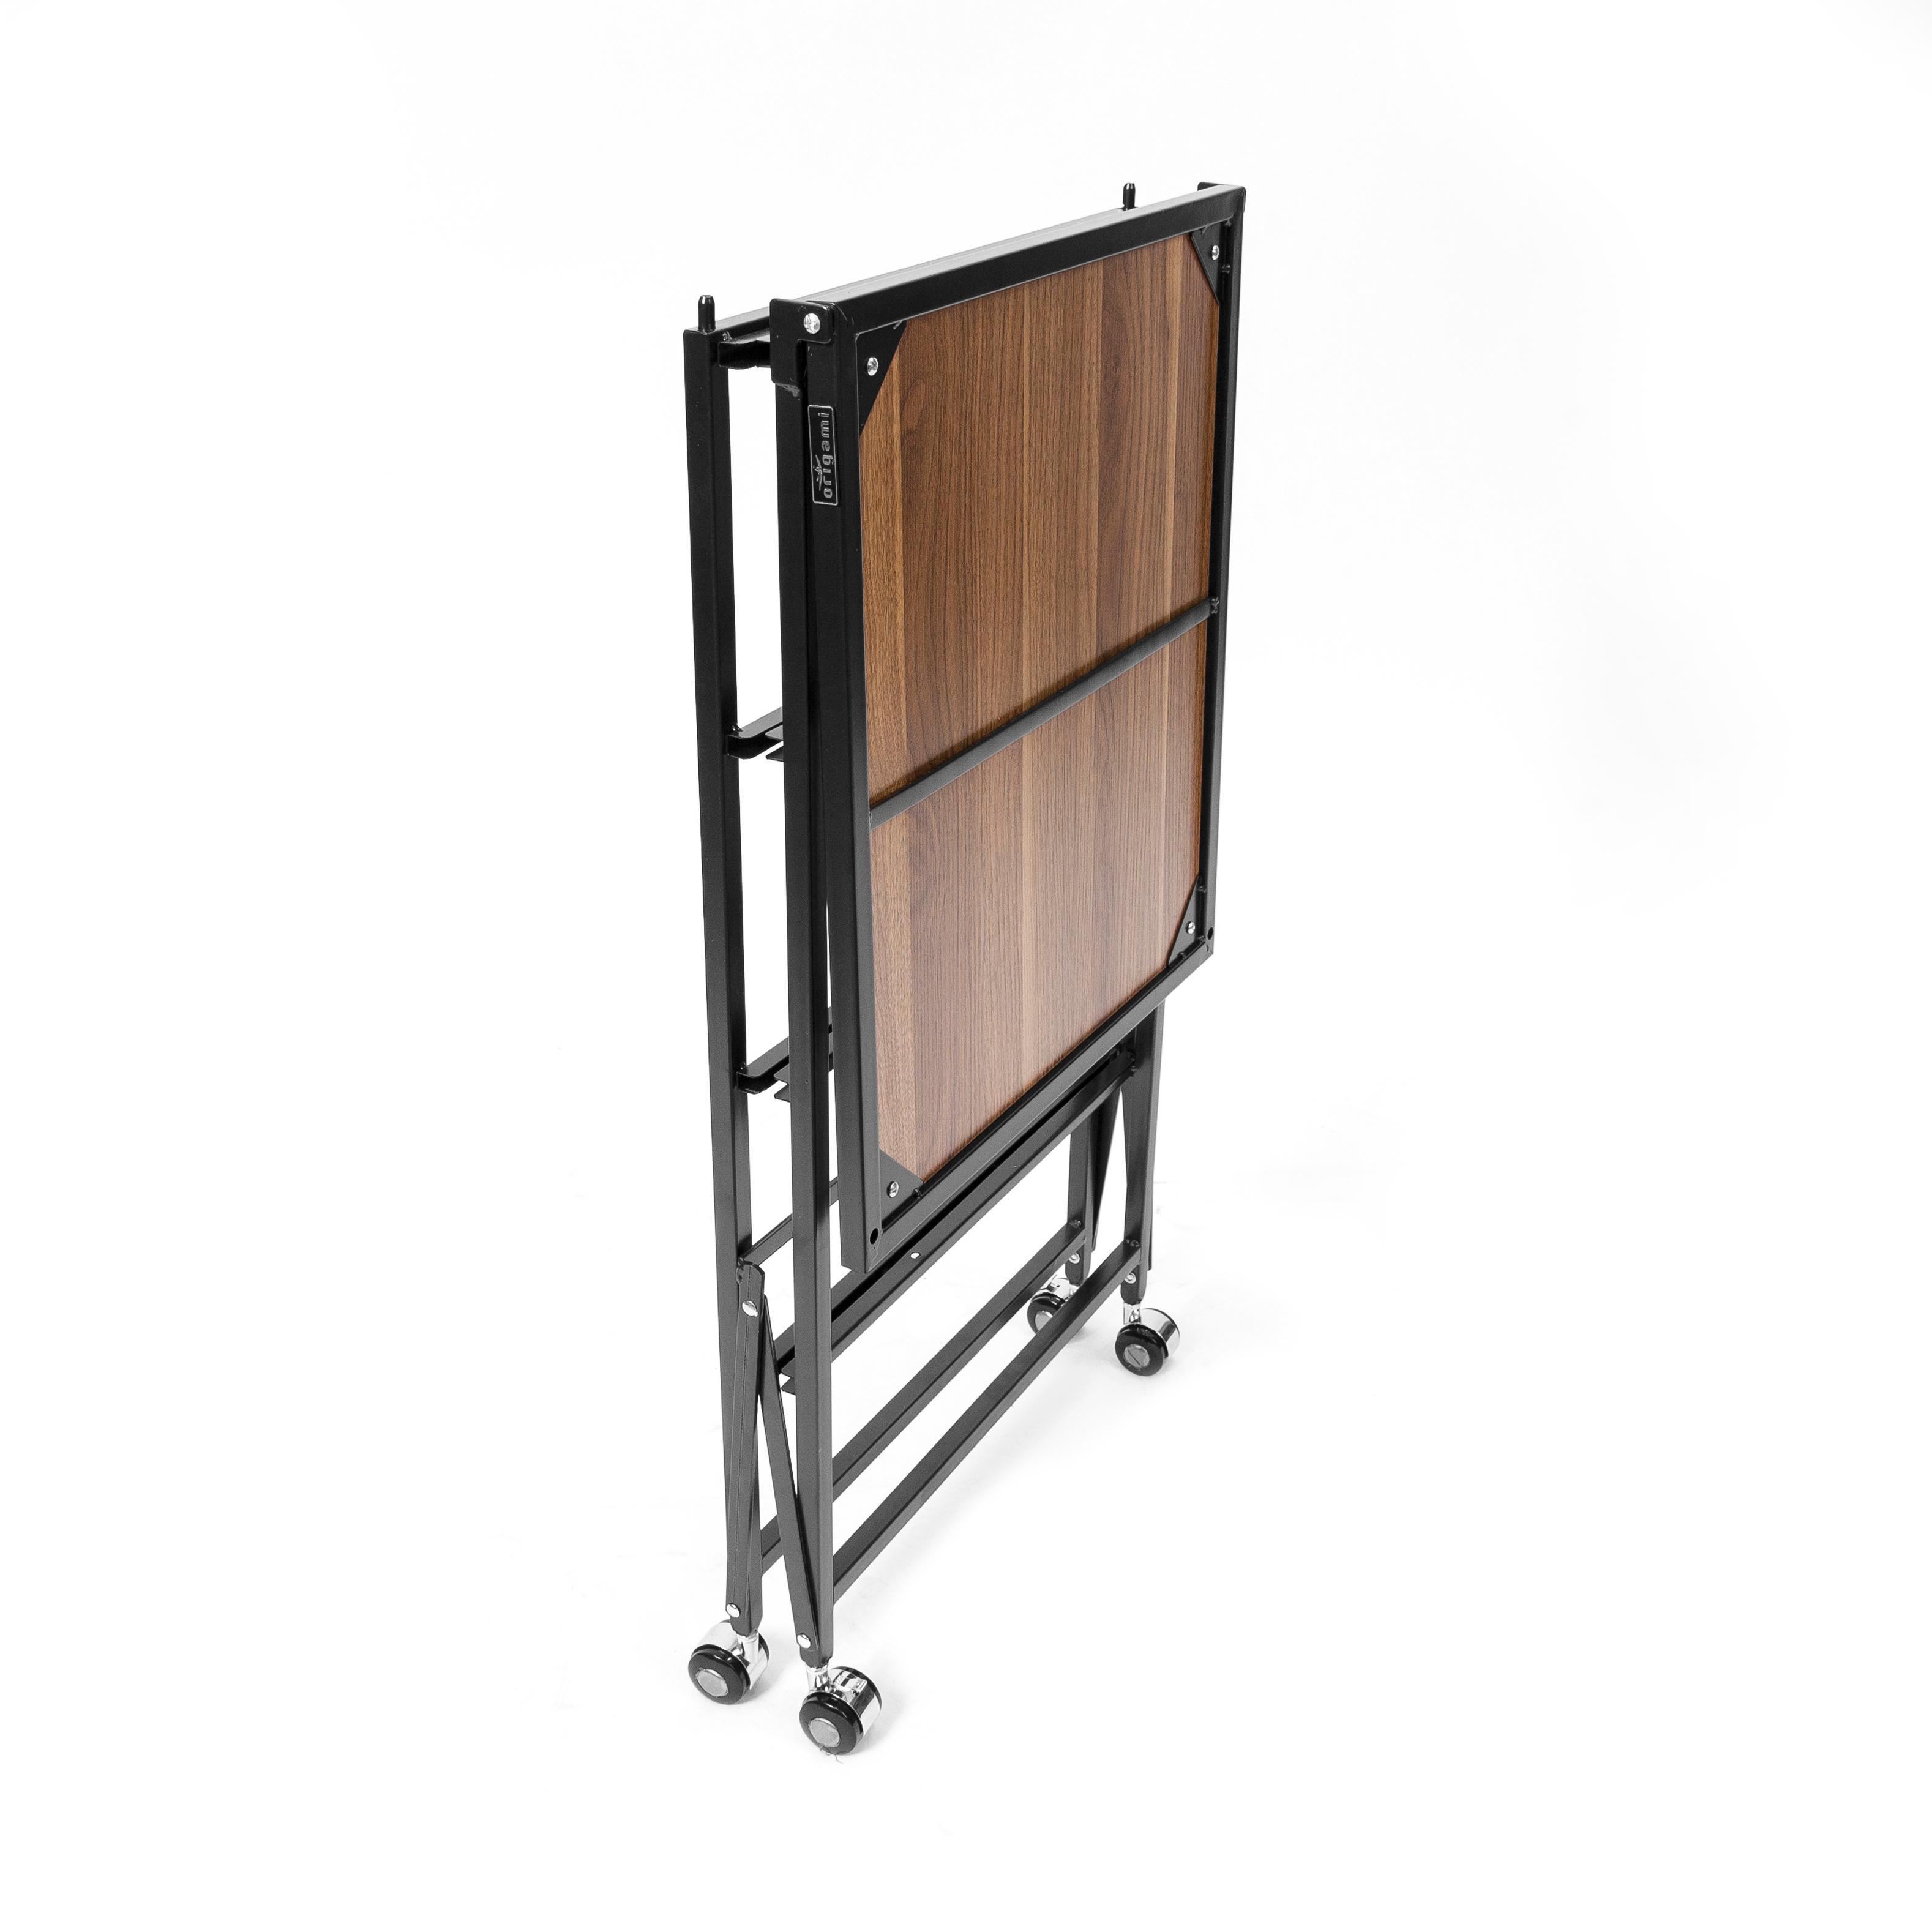 Amazon.com: Origami Foldable 4 Tier Drawer Wood Shelf ... - photo#9